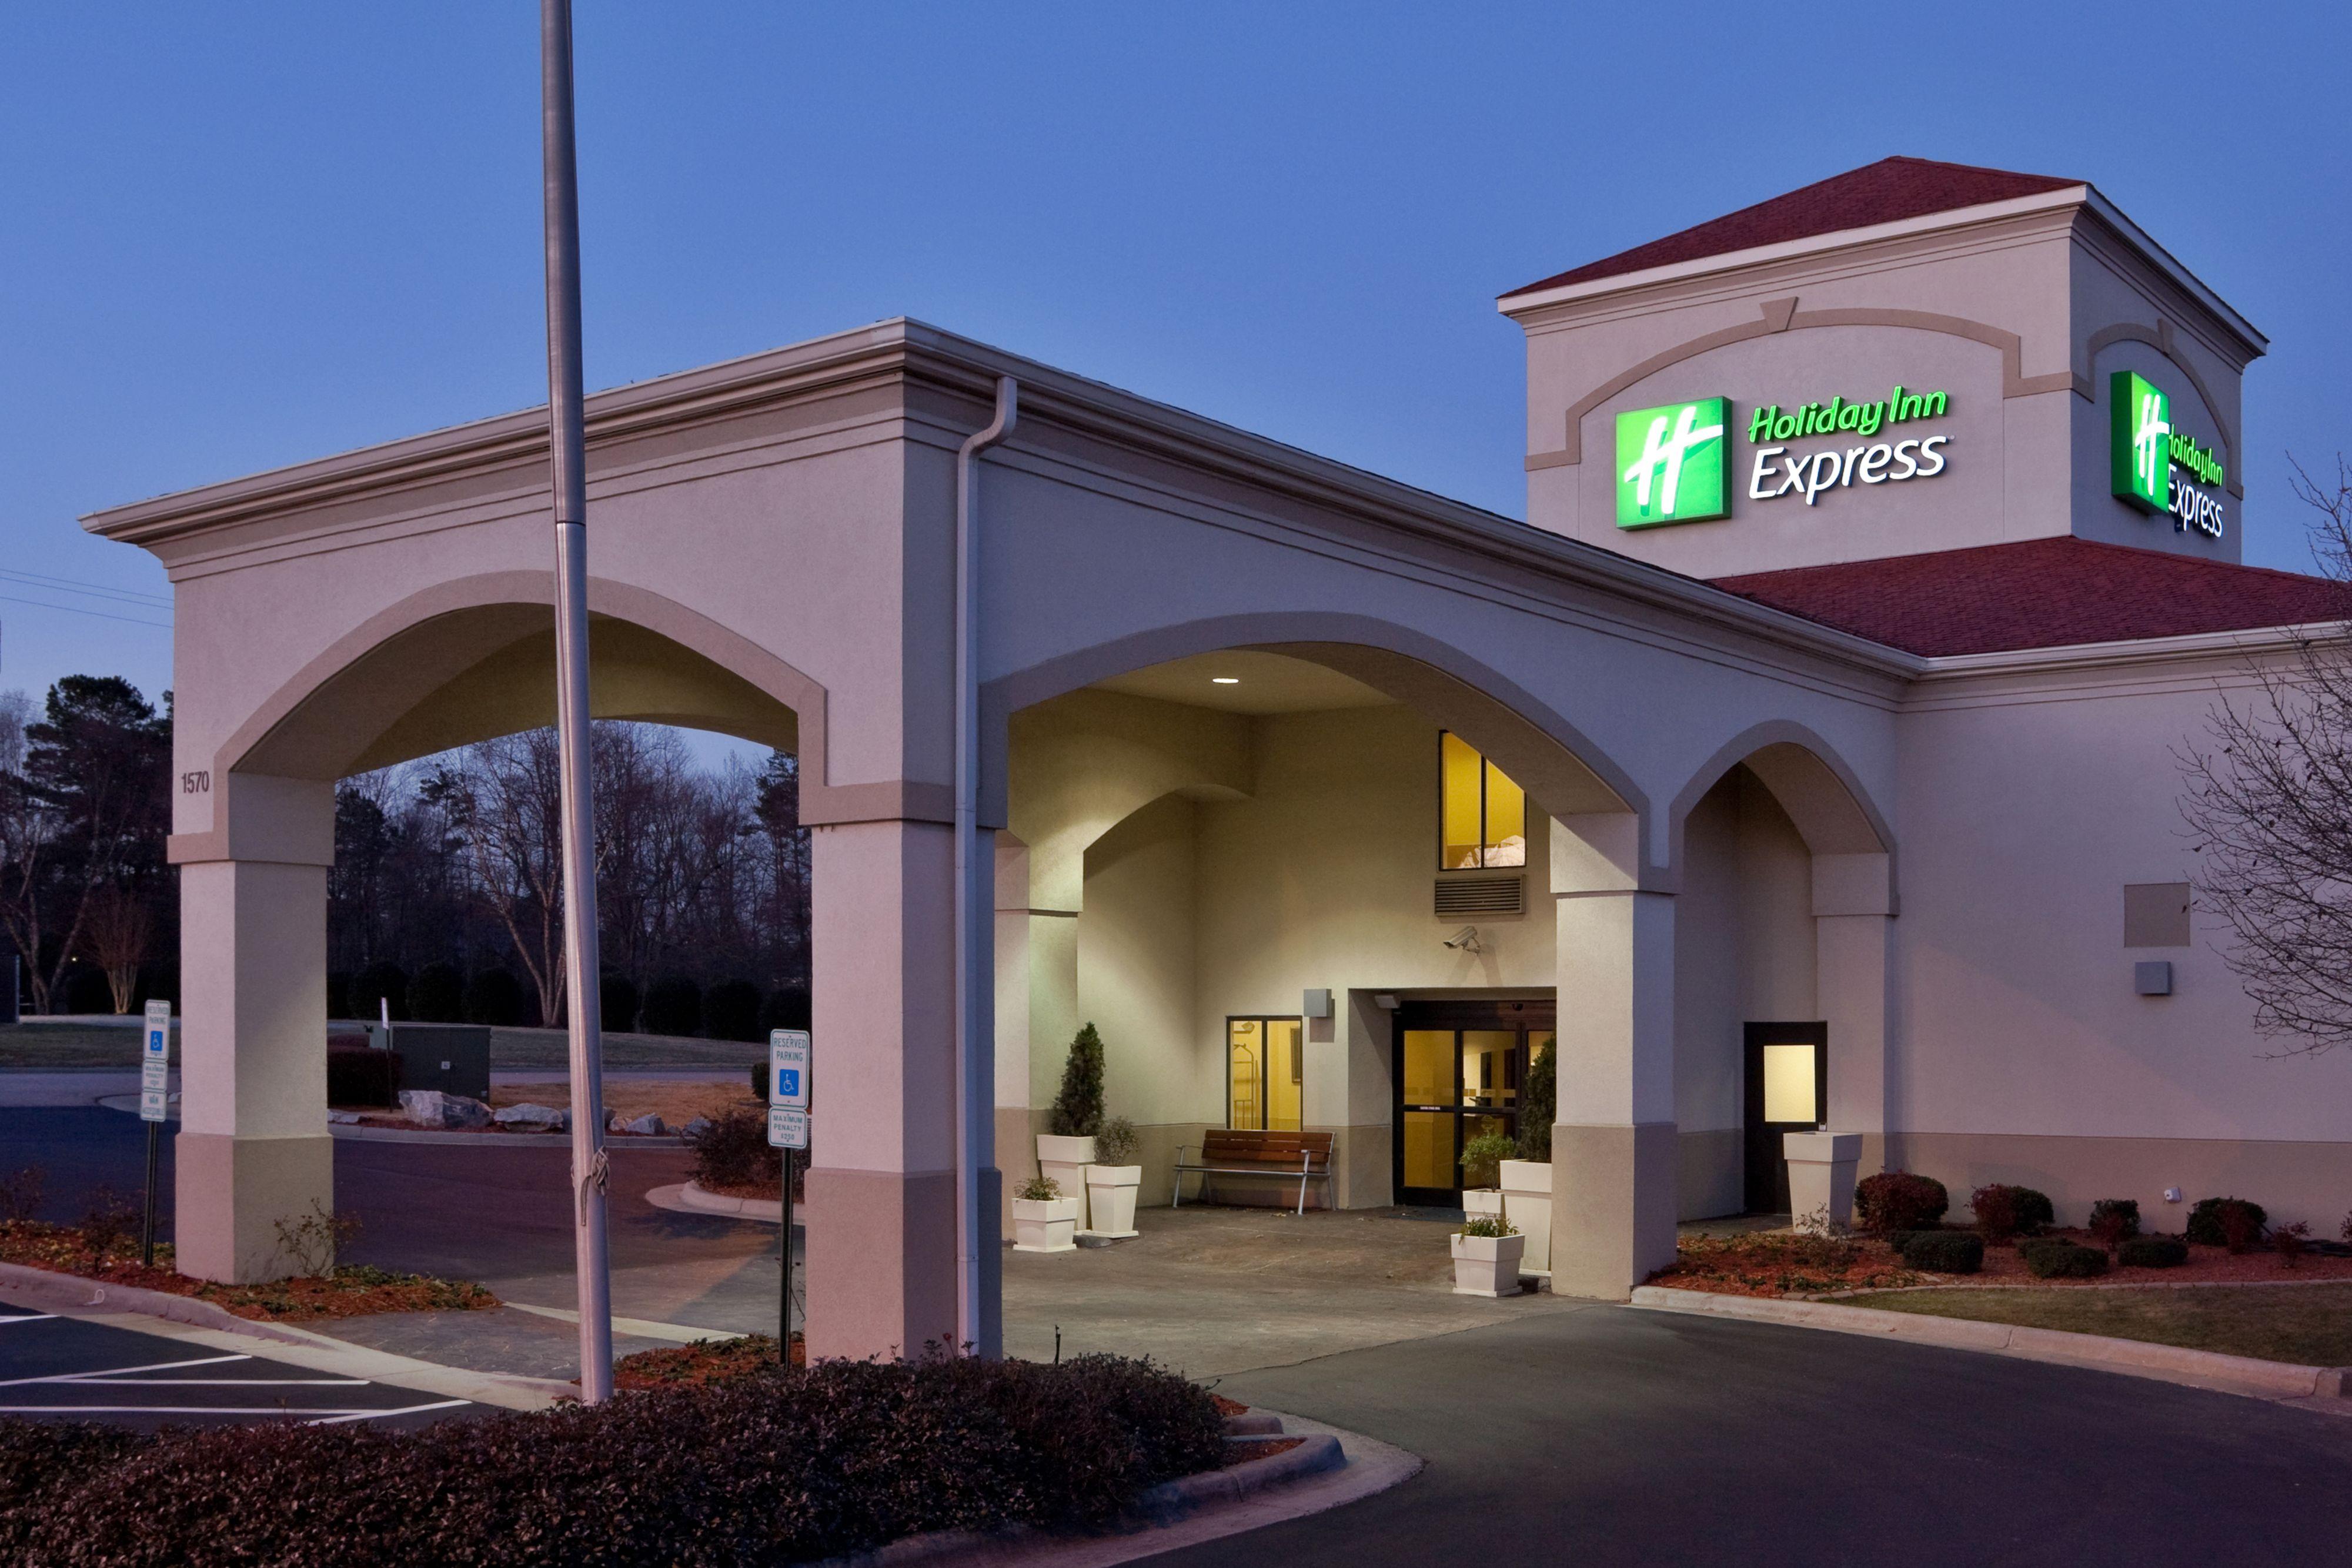 Holiday Inn Express Kenedy Kenedy UnitedStates